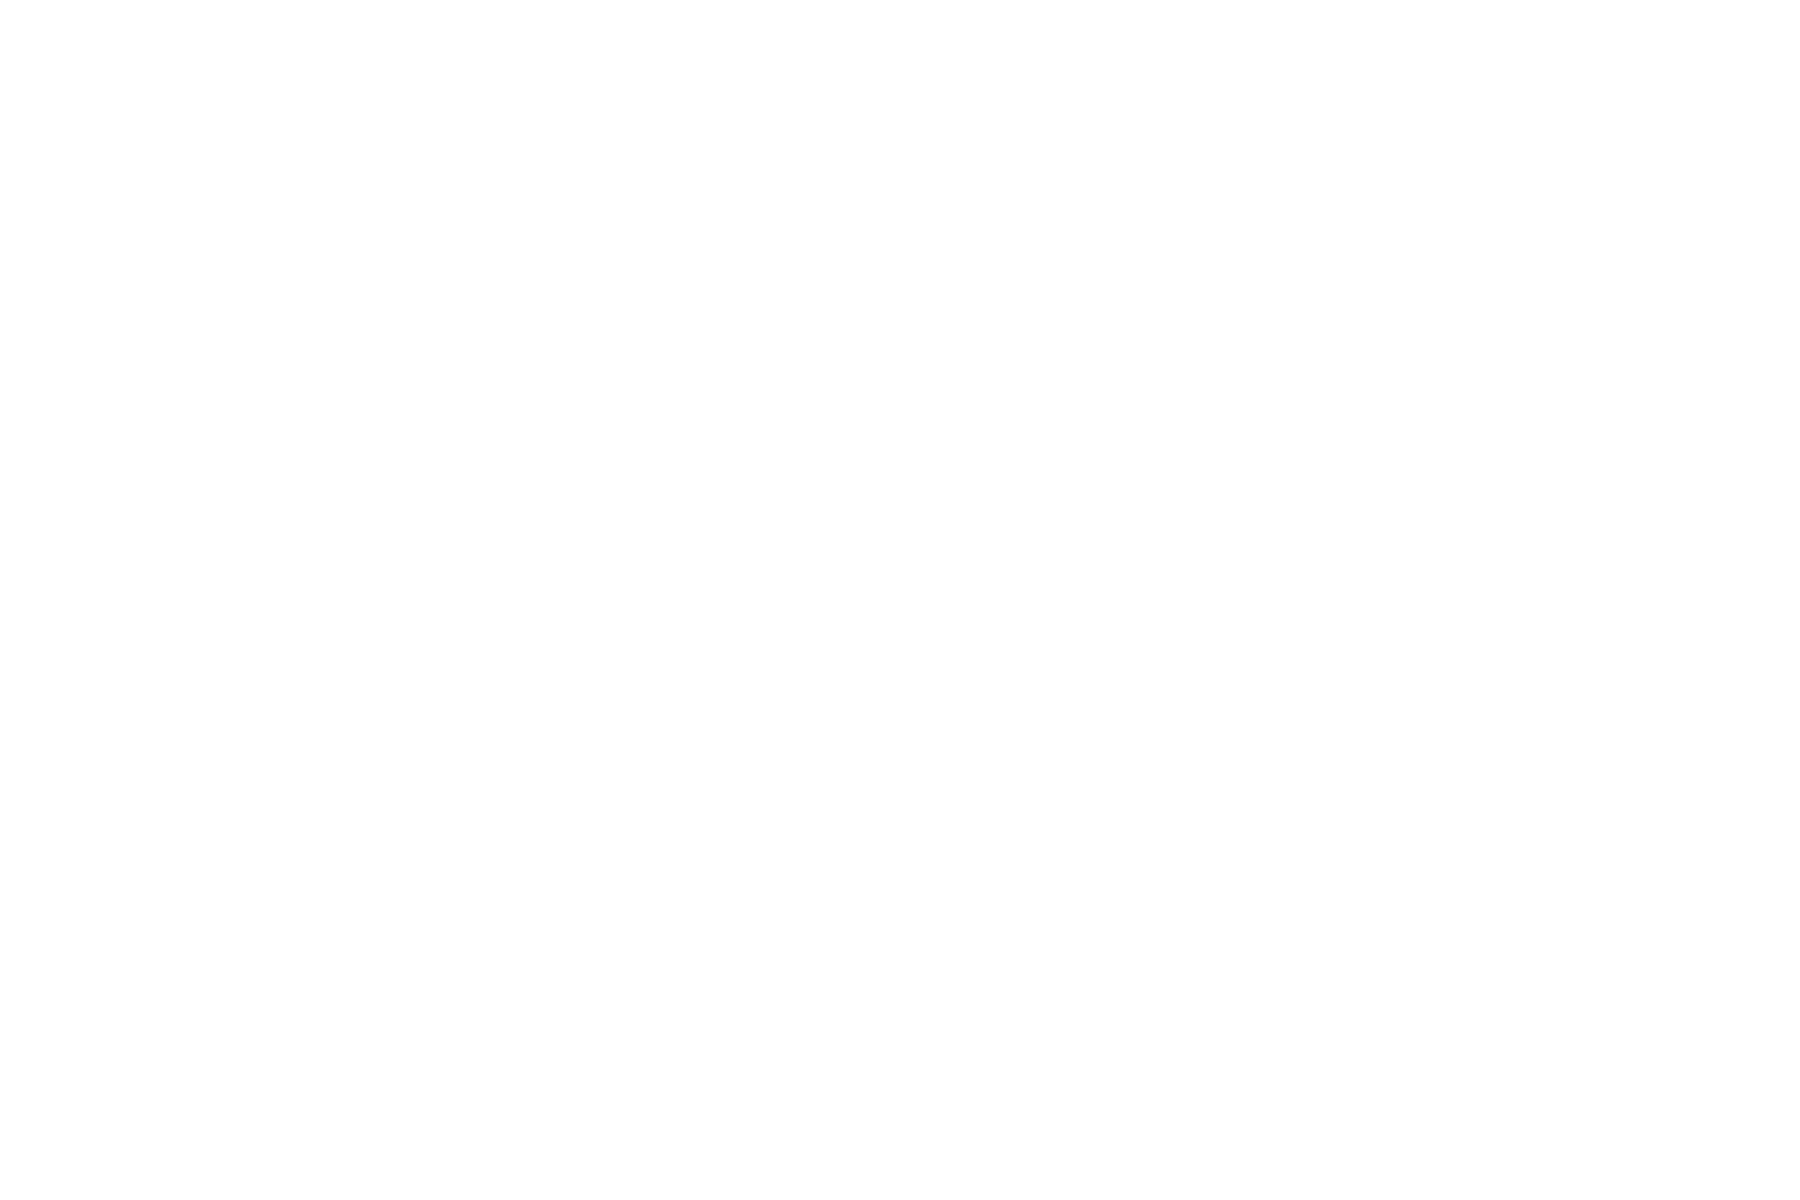 DESIGN-TEXT